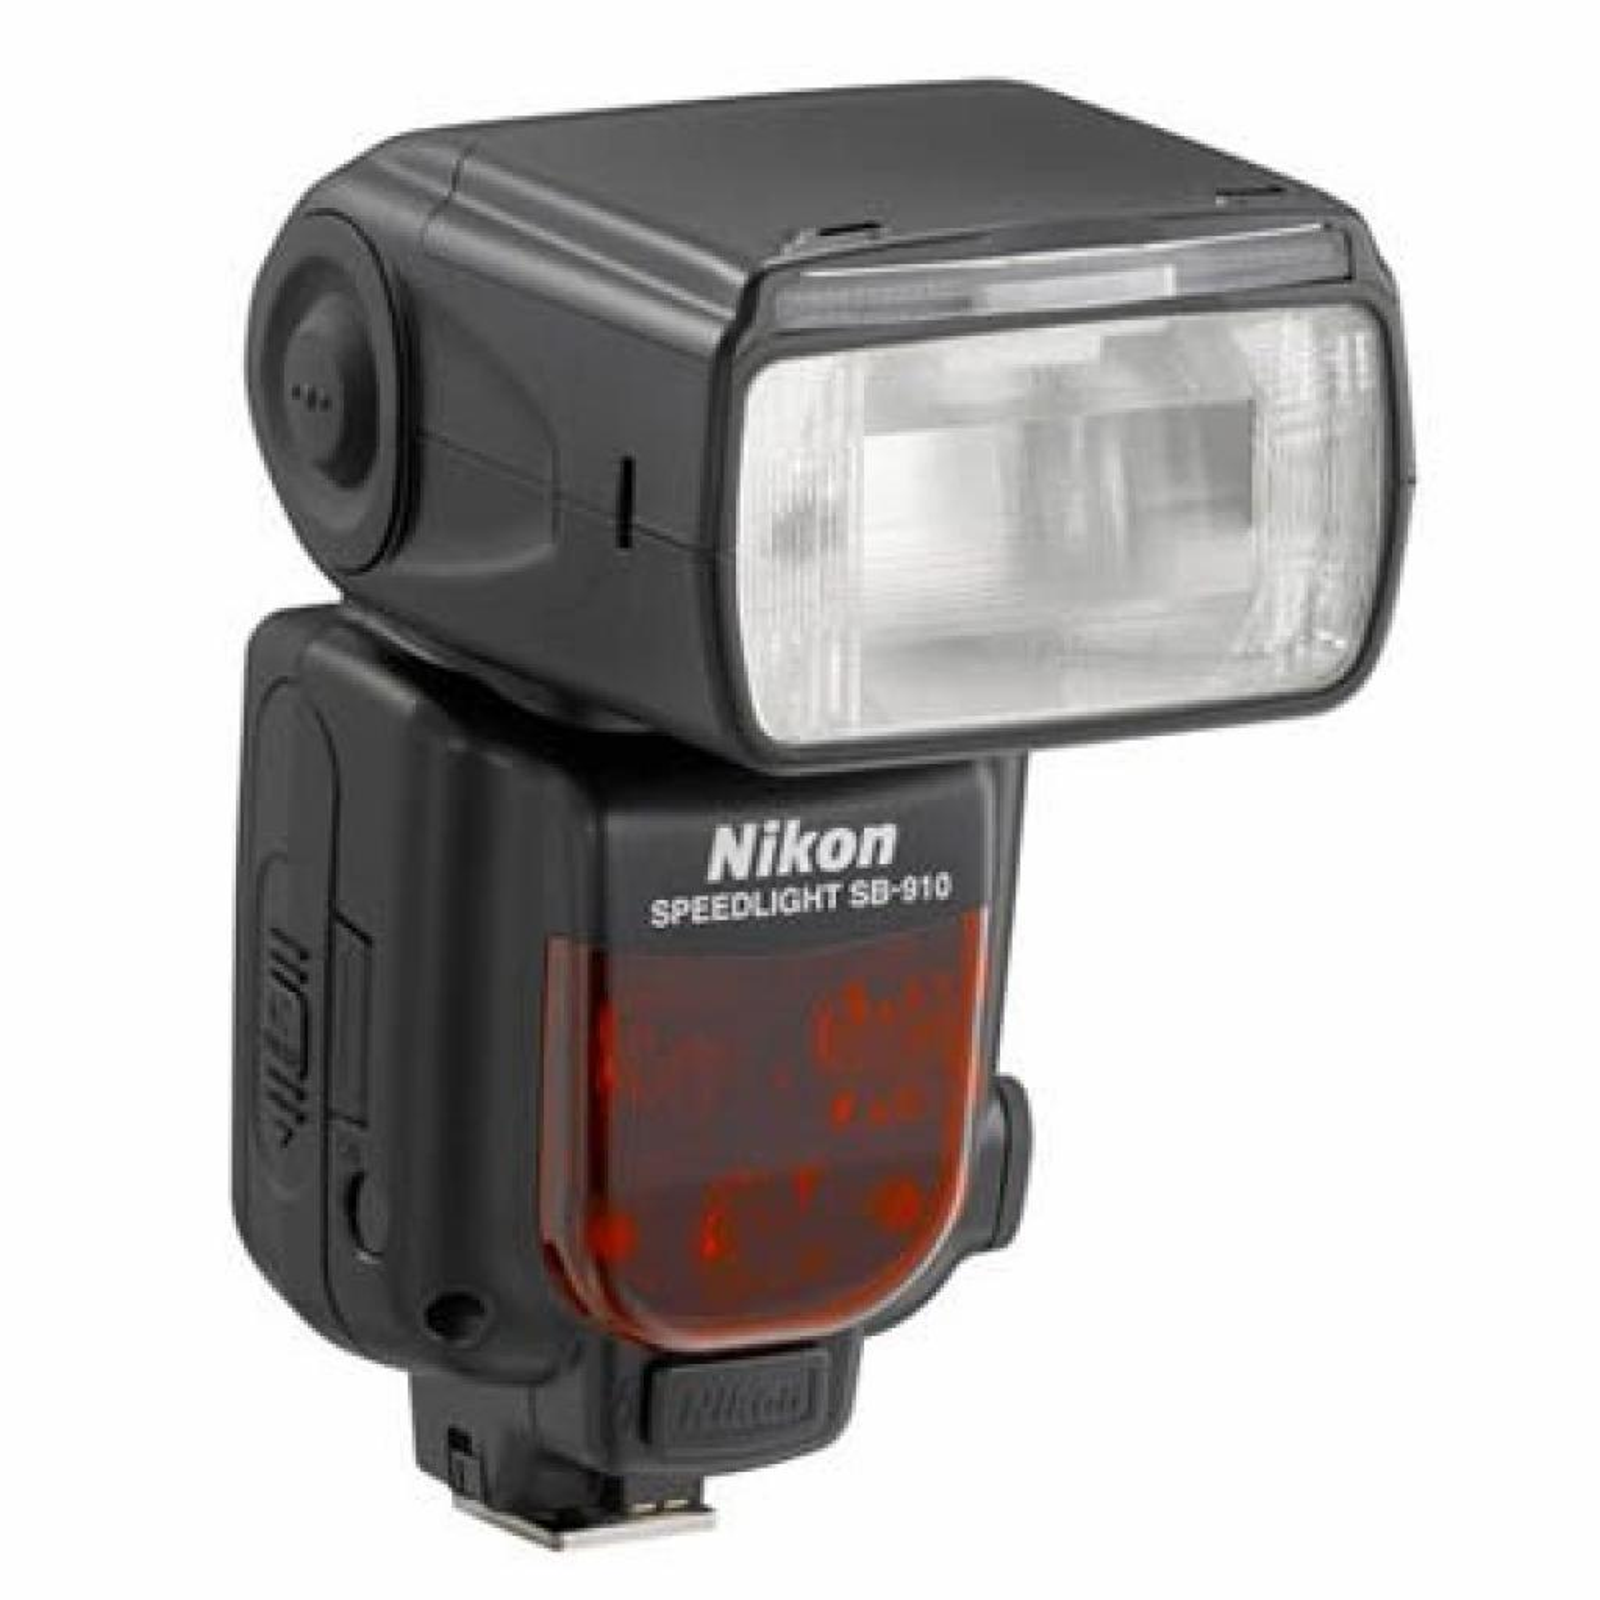 Вспышка Speedlight SB-910 Nikon (FSA04001)